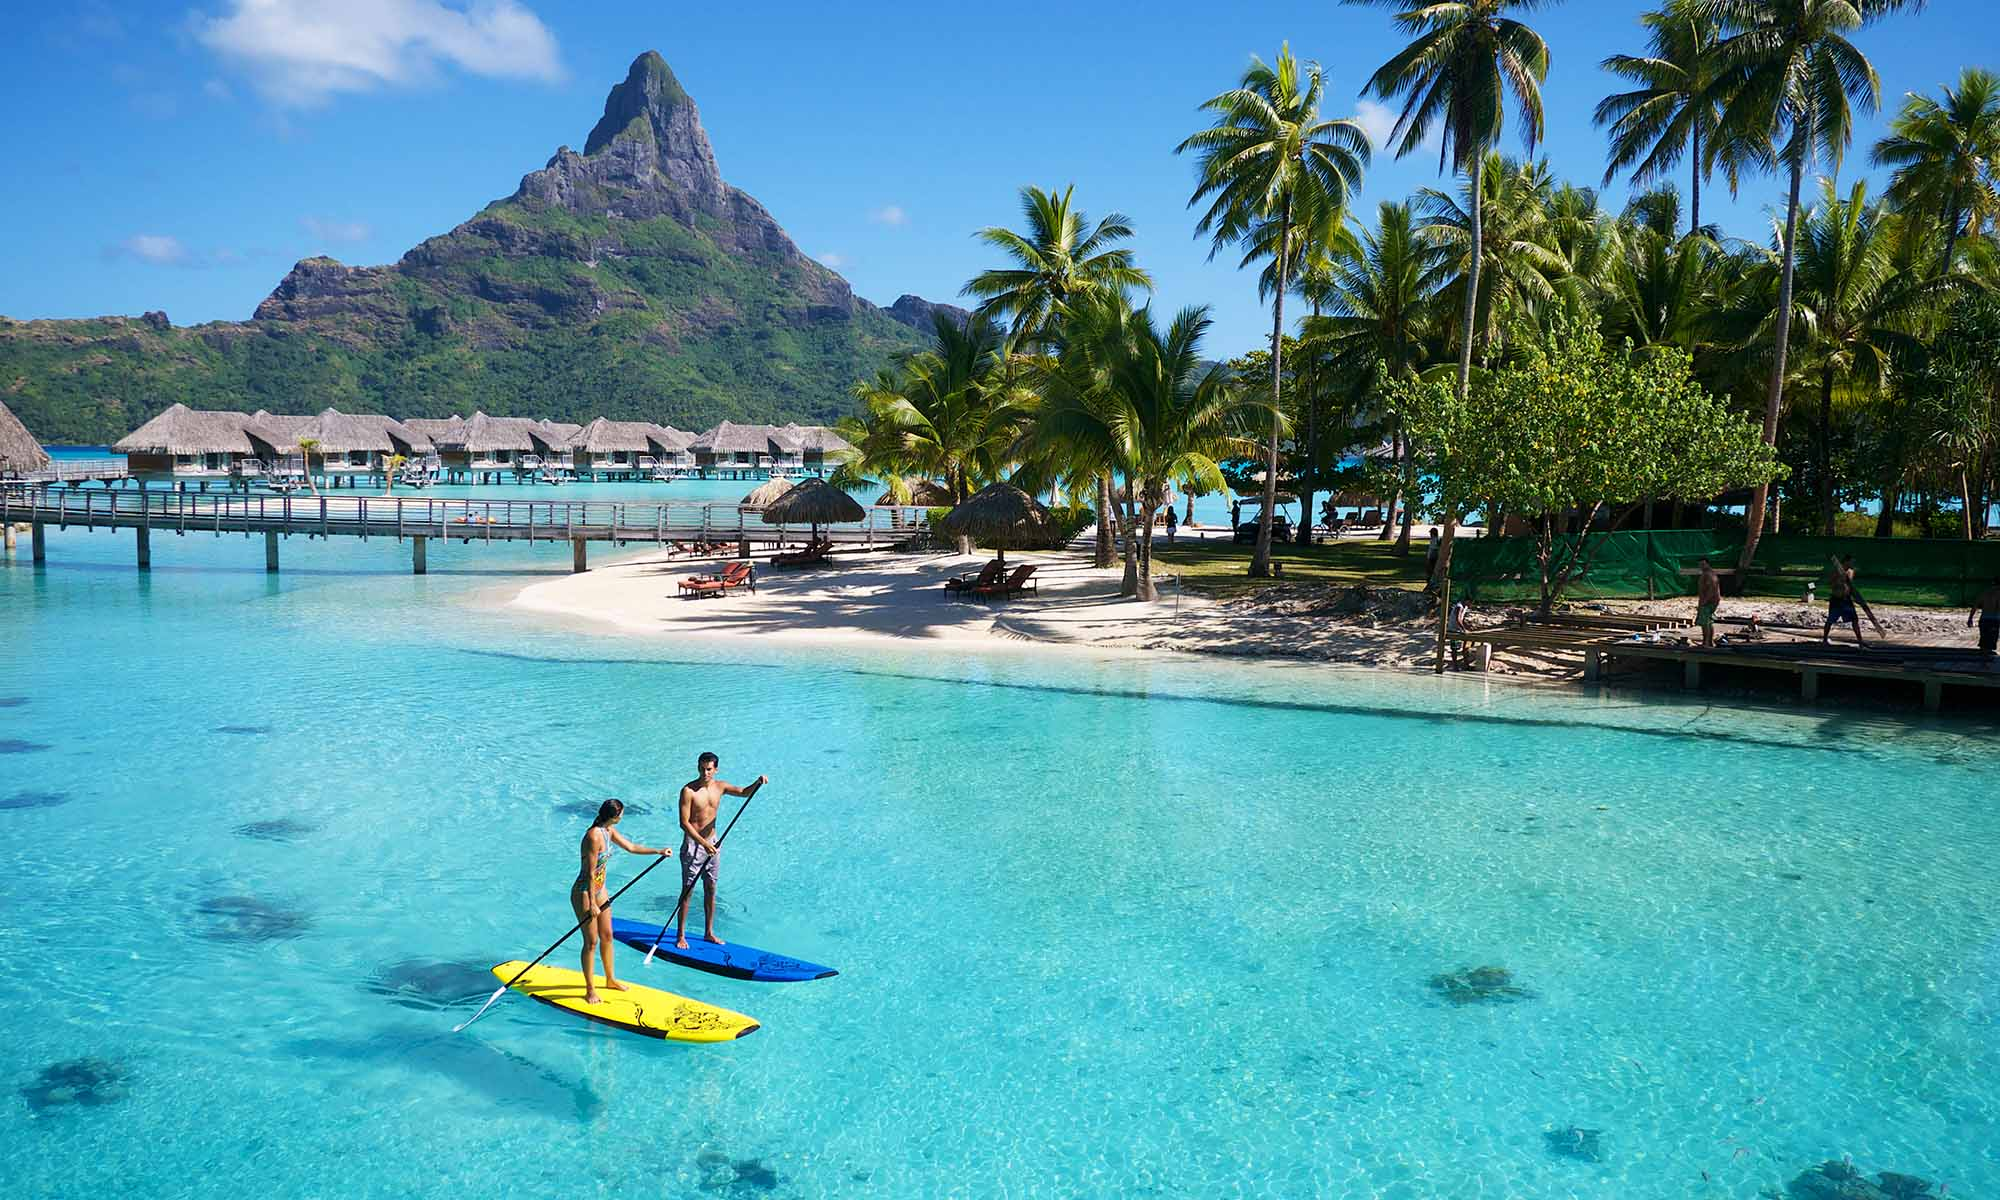 What to Do When In Bora Bora| Bora Bora Travel, Travel, Travel Ideas, Fun in Bora Bora, What to Do In Bora #Travel #BoraBora